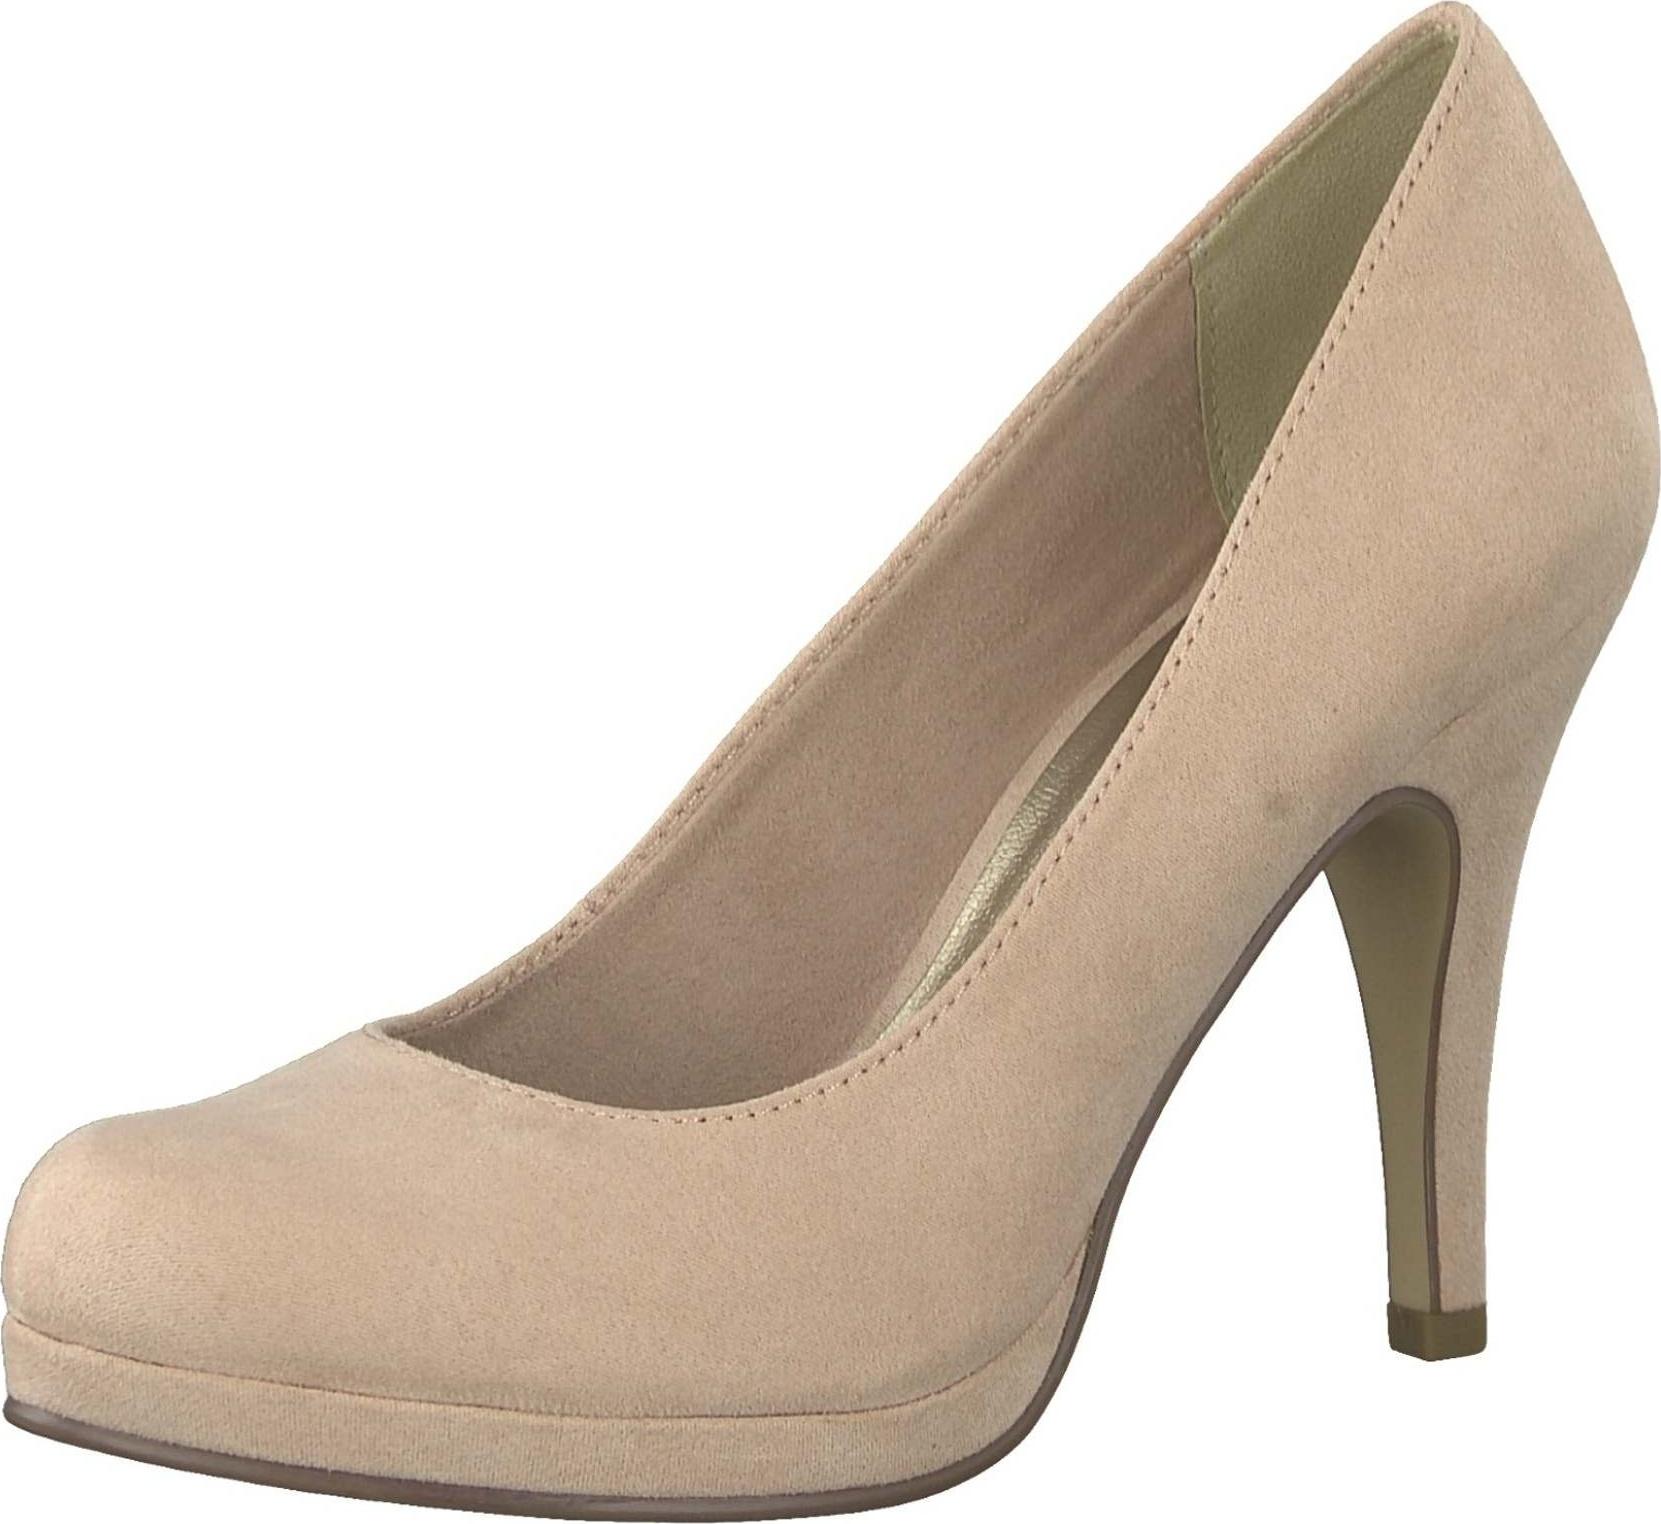 Dámská obuv Tamaris 1-1-22407-22 ROSE 521 – E-shop Tamaris f8dbfaa866